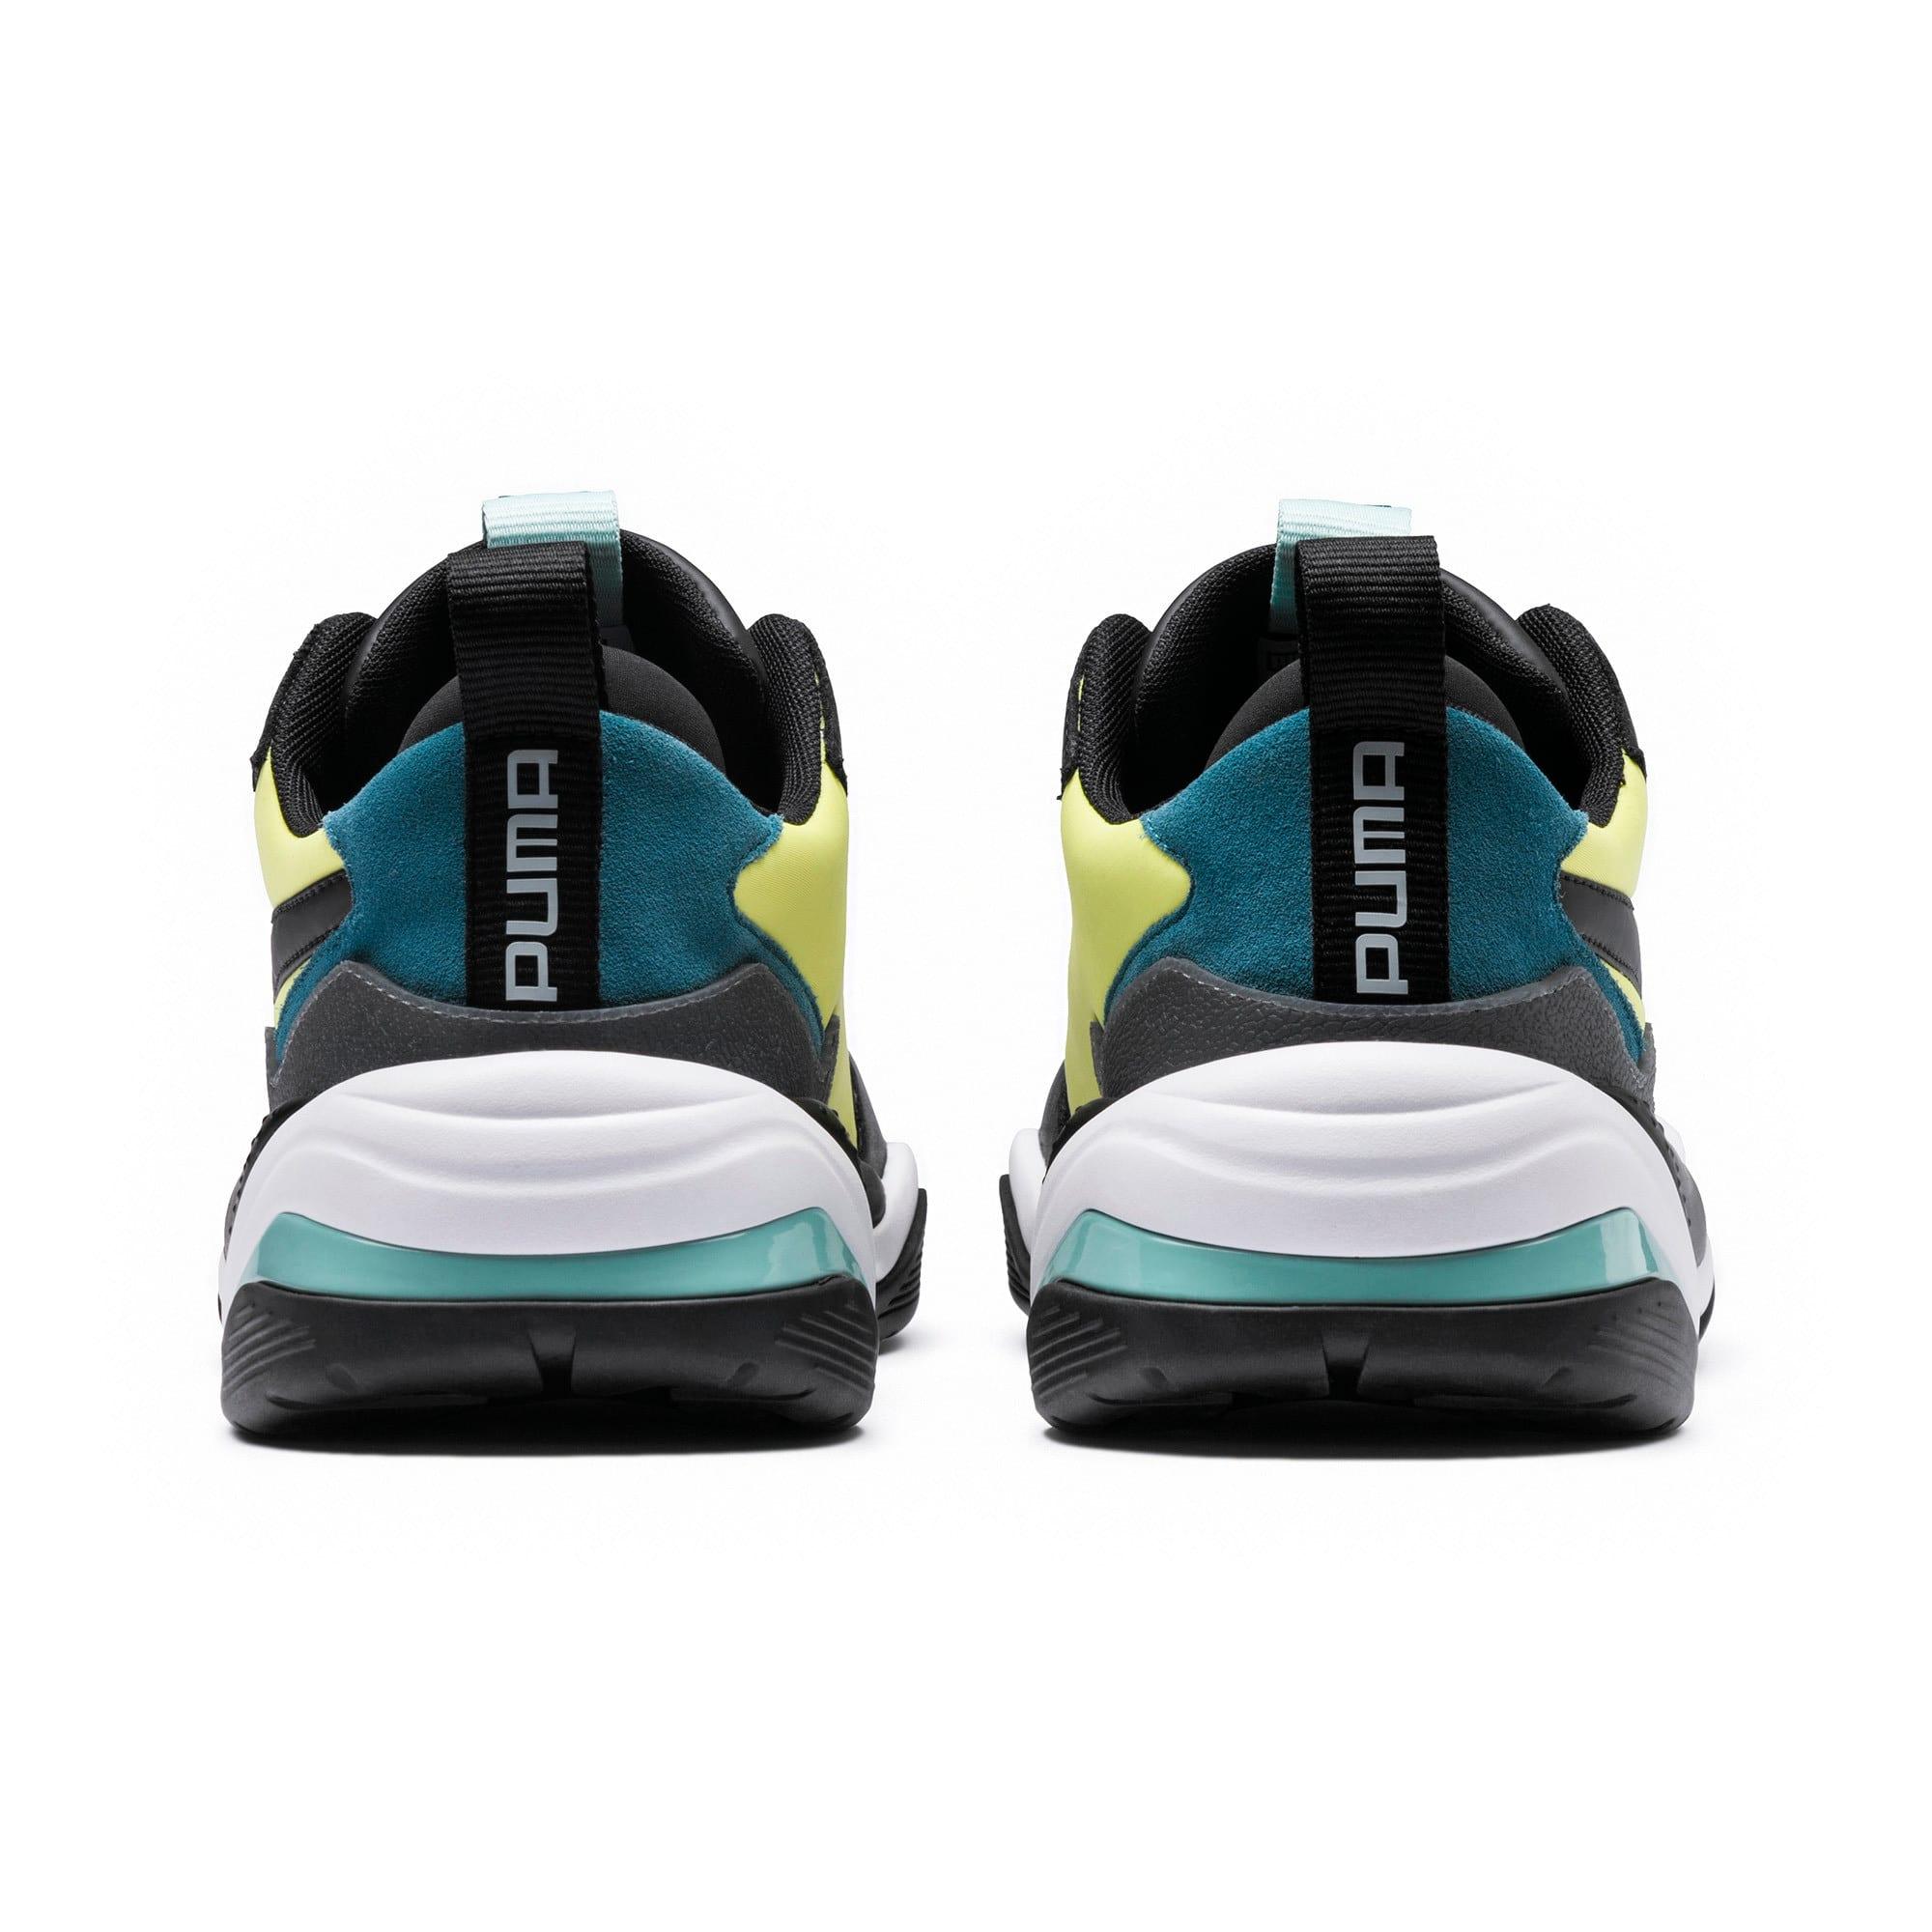 Thumbnail 4 of Thunder Spectra Sneakers, Puma Blk-Puma Blk-Puma White, medium